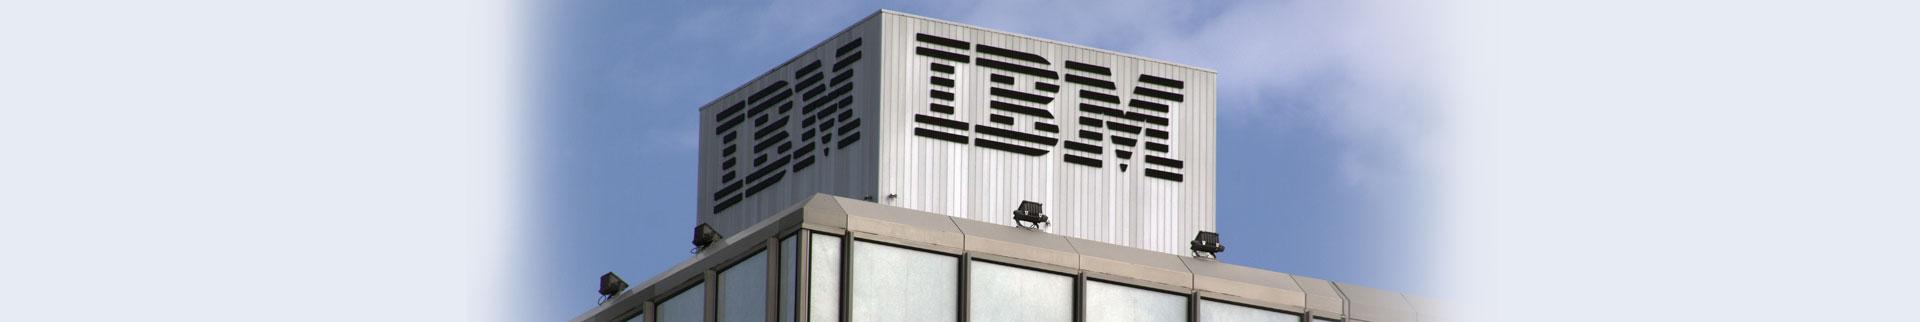 IBM Splits into two companies